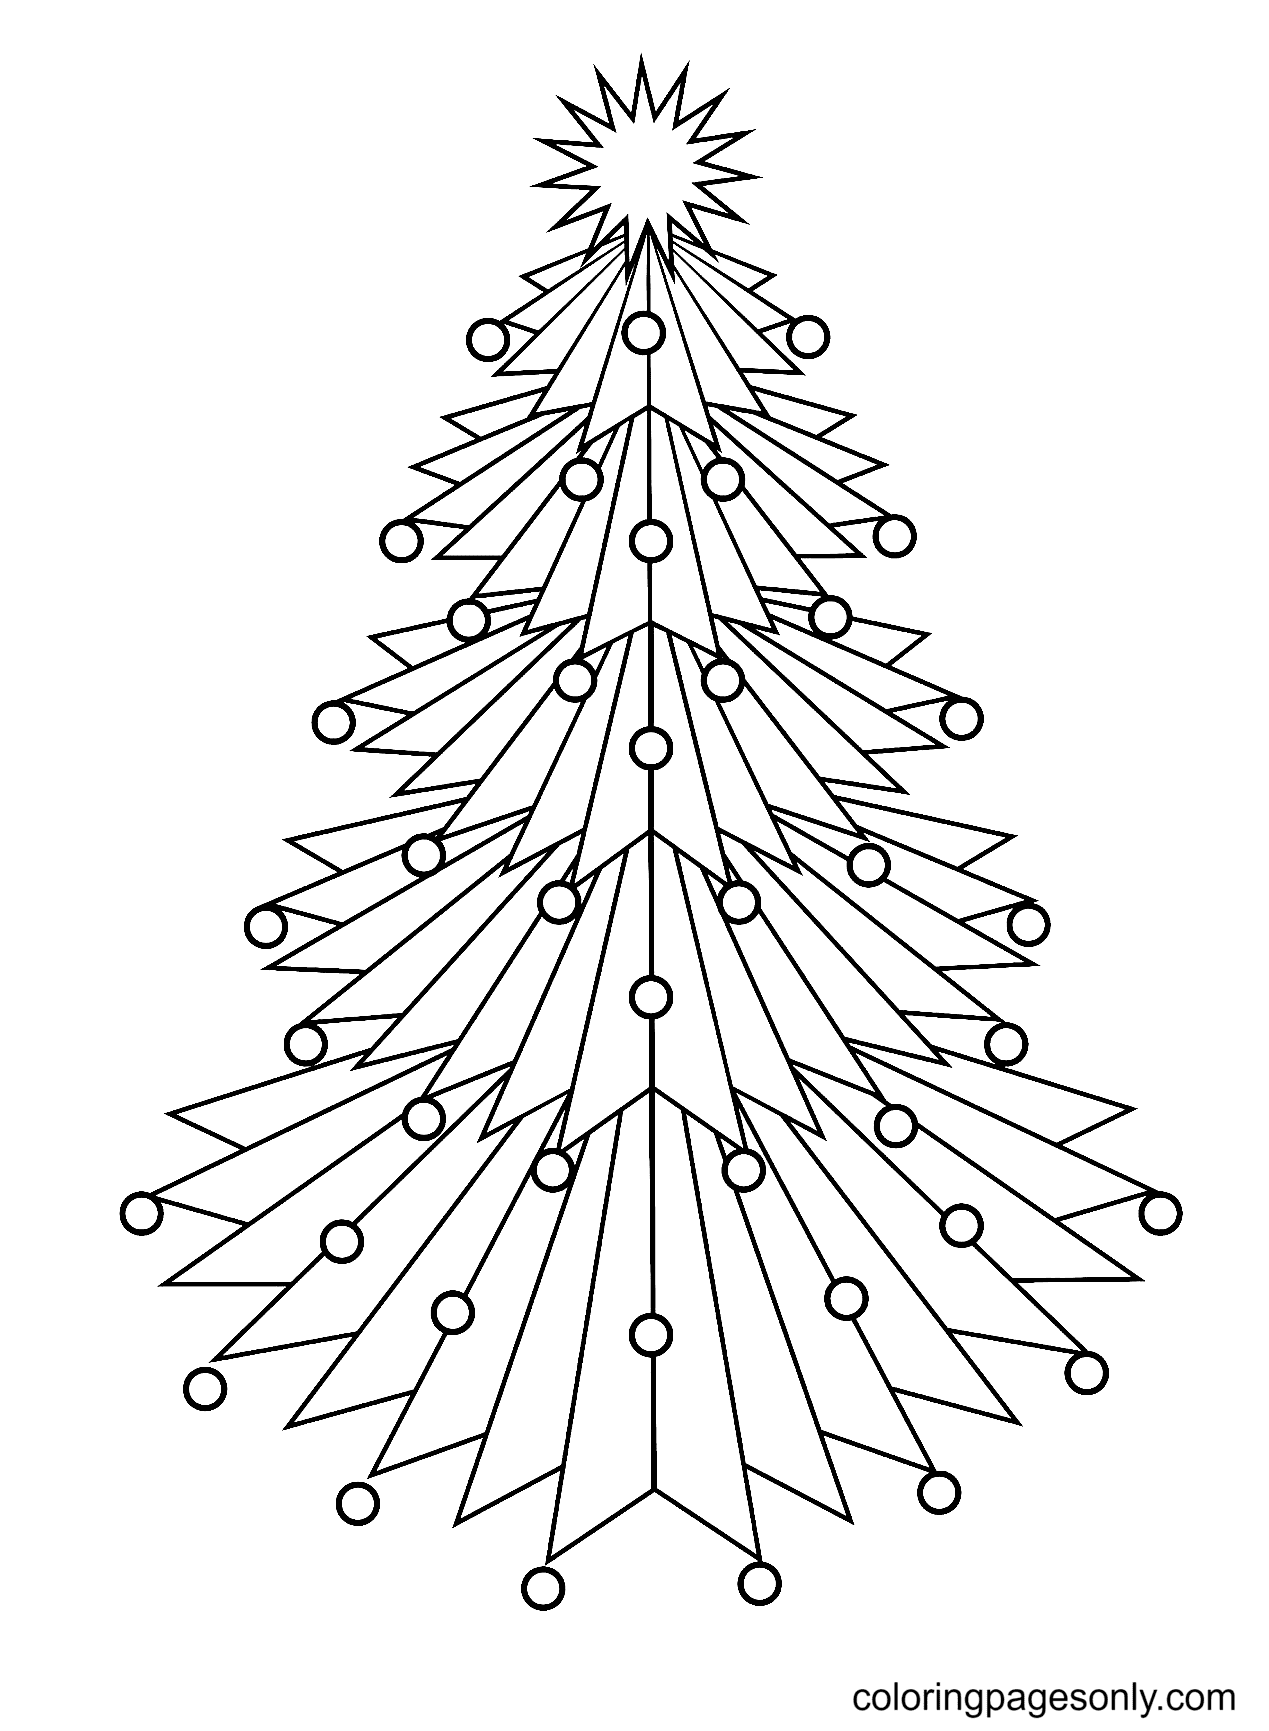 Spiky Angled Christmas Tree Coloring Page